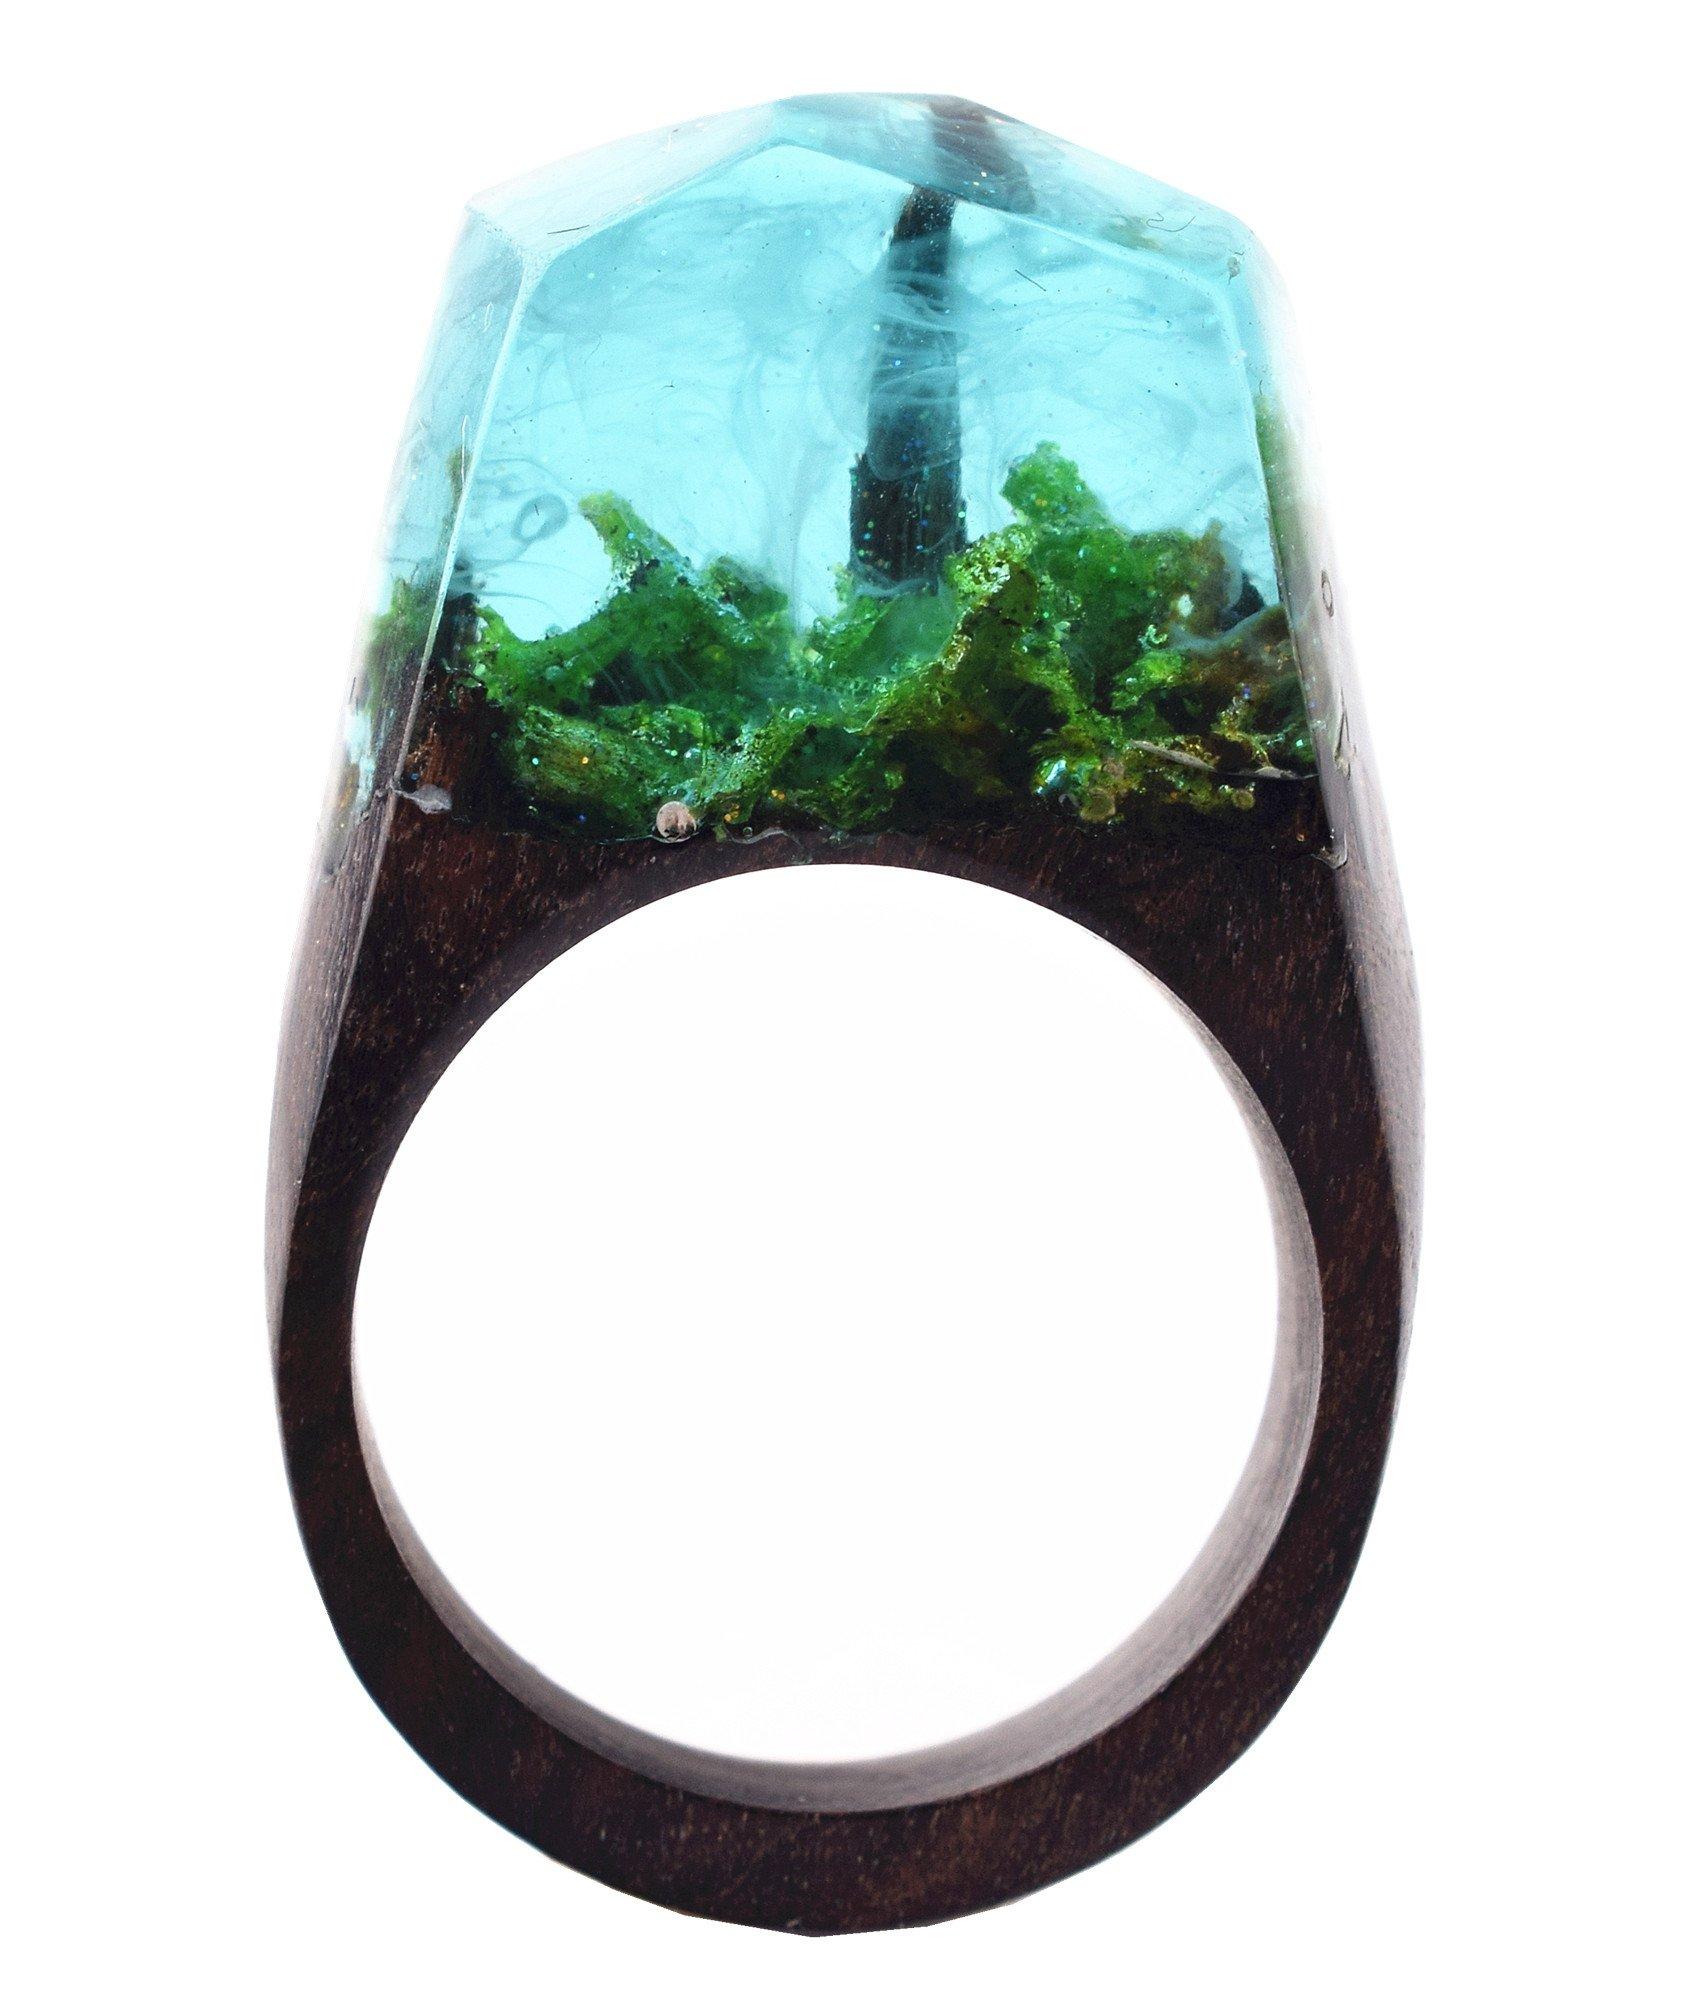 Heyou Love Handmade Wood Resin Rings Secret Forest Landscape Inside Ring Jewelry For Unisex (Style1, 9)